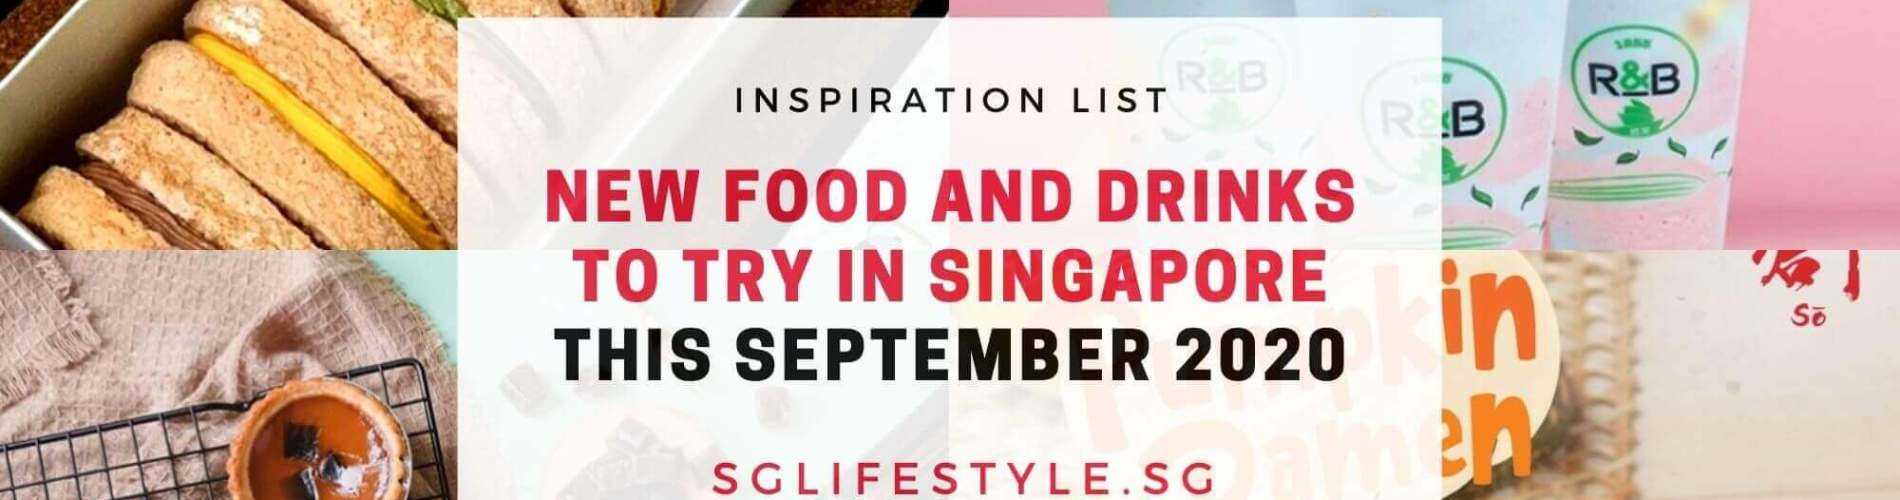 new food drinks singapore september 2020